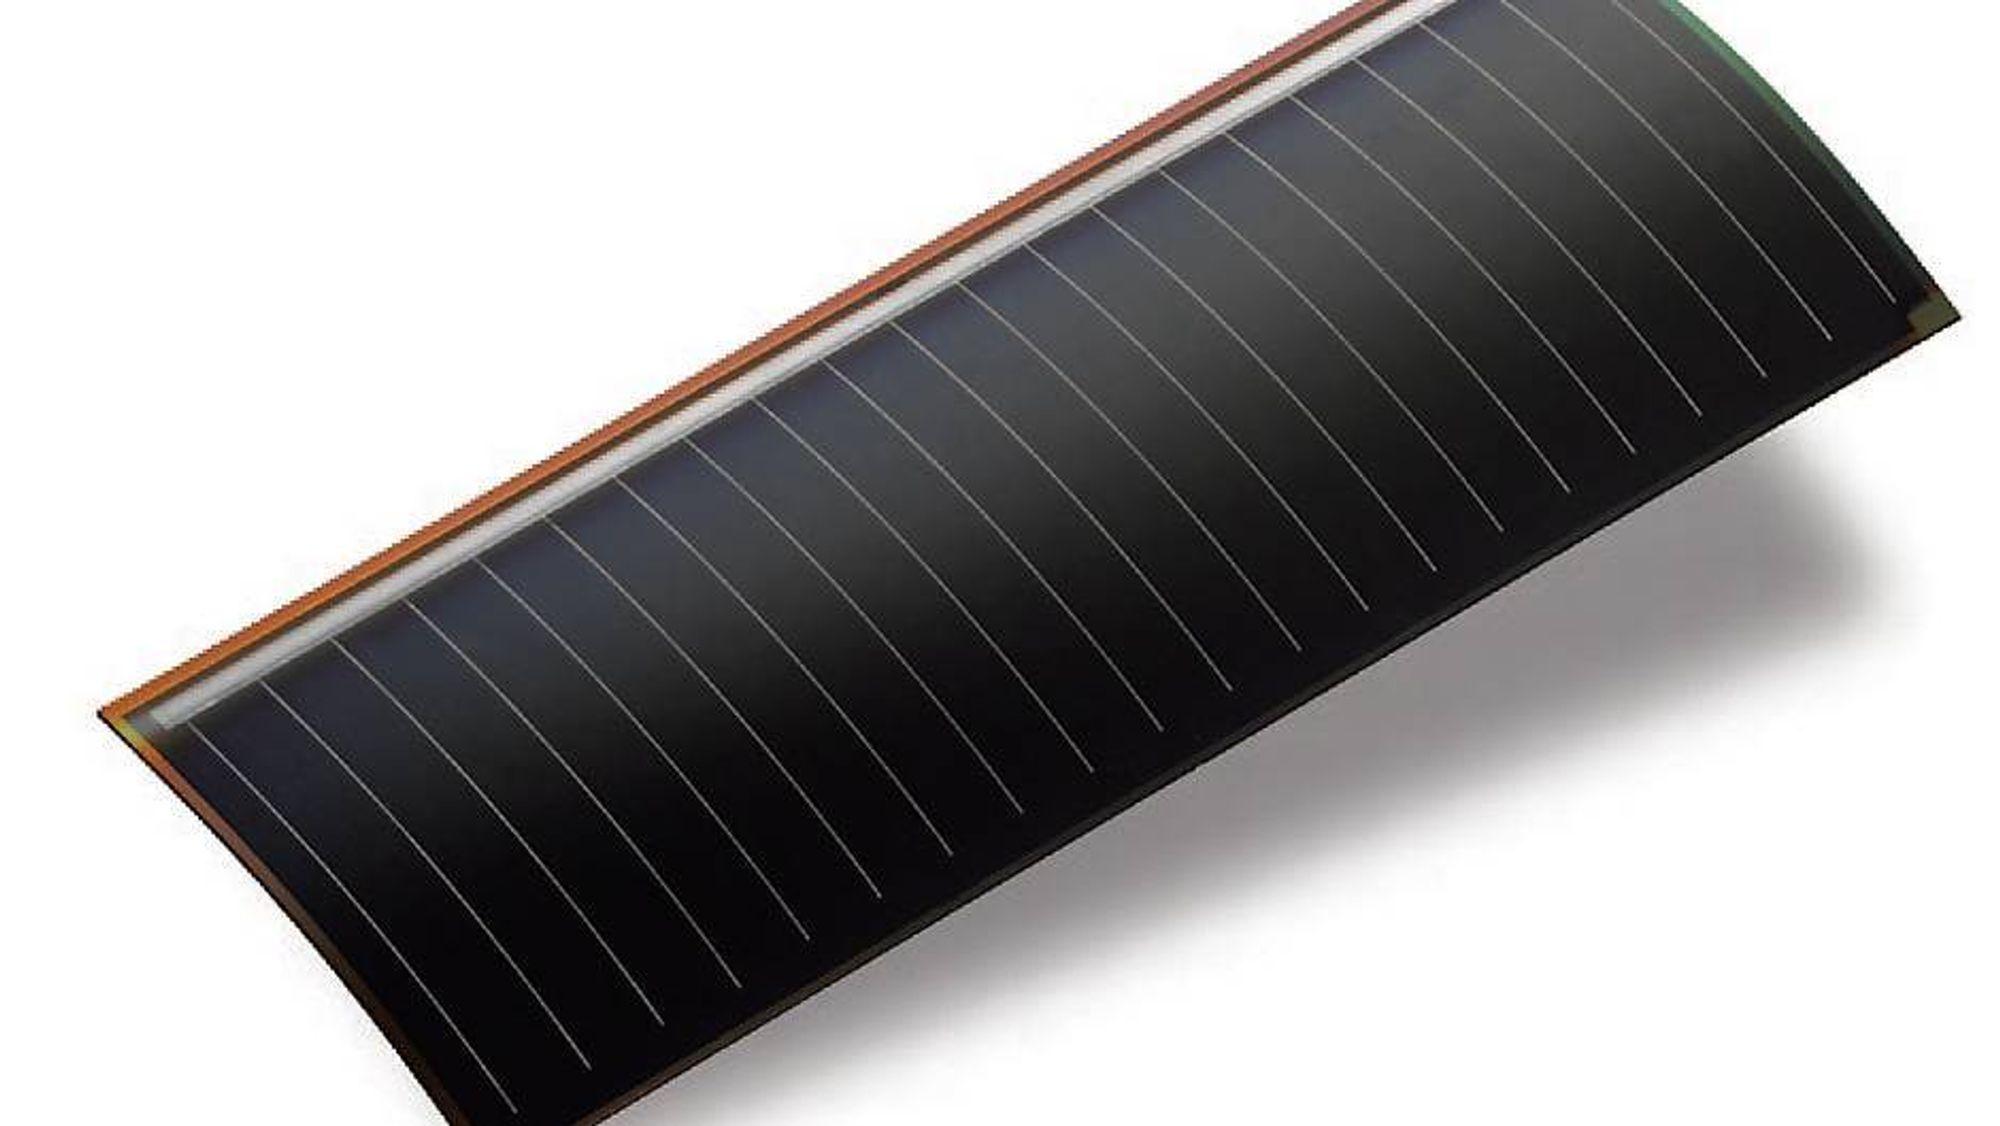 Ny solcelle kan forlenge batteritiden